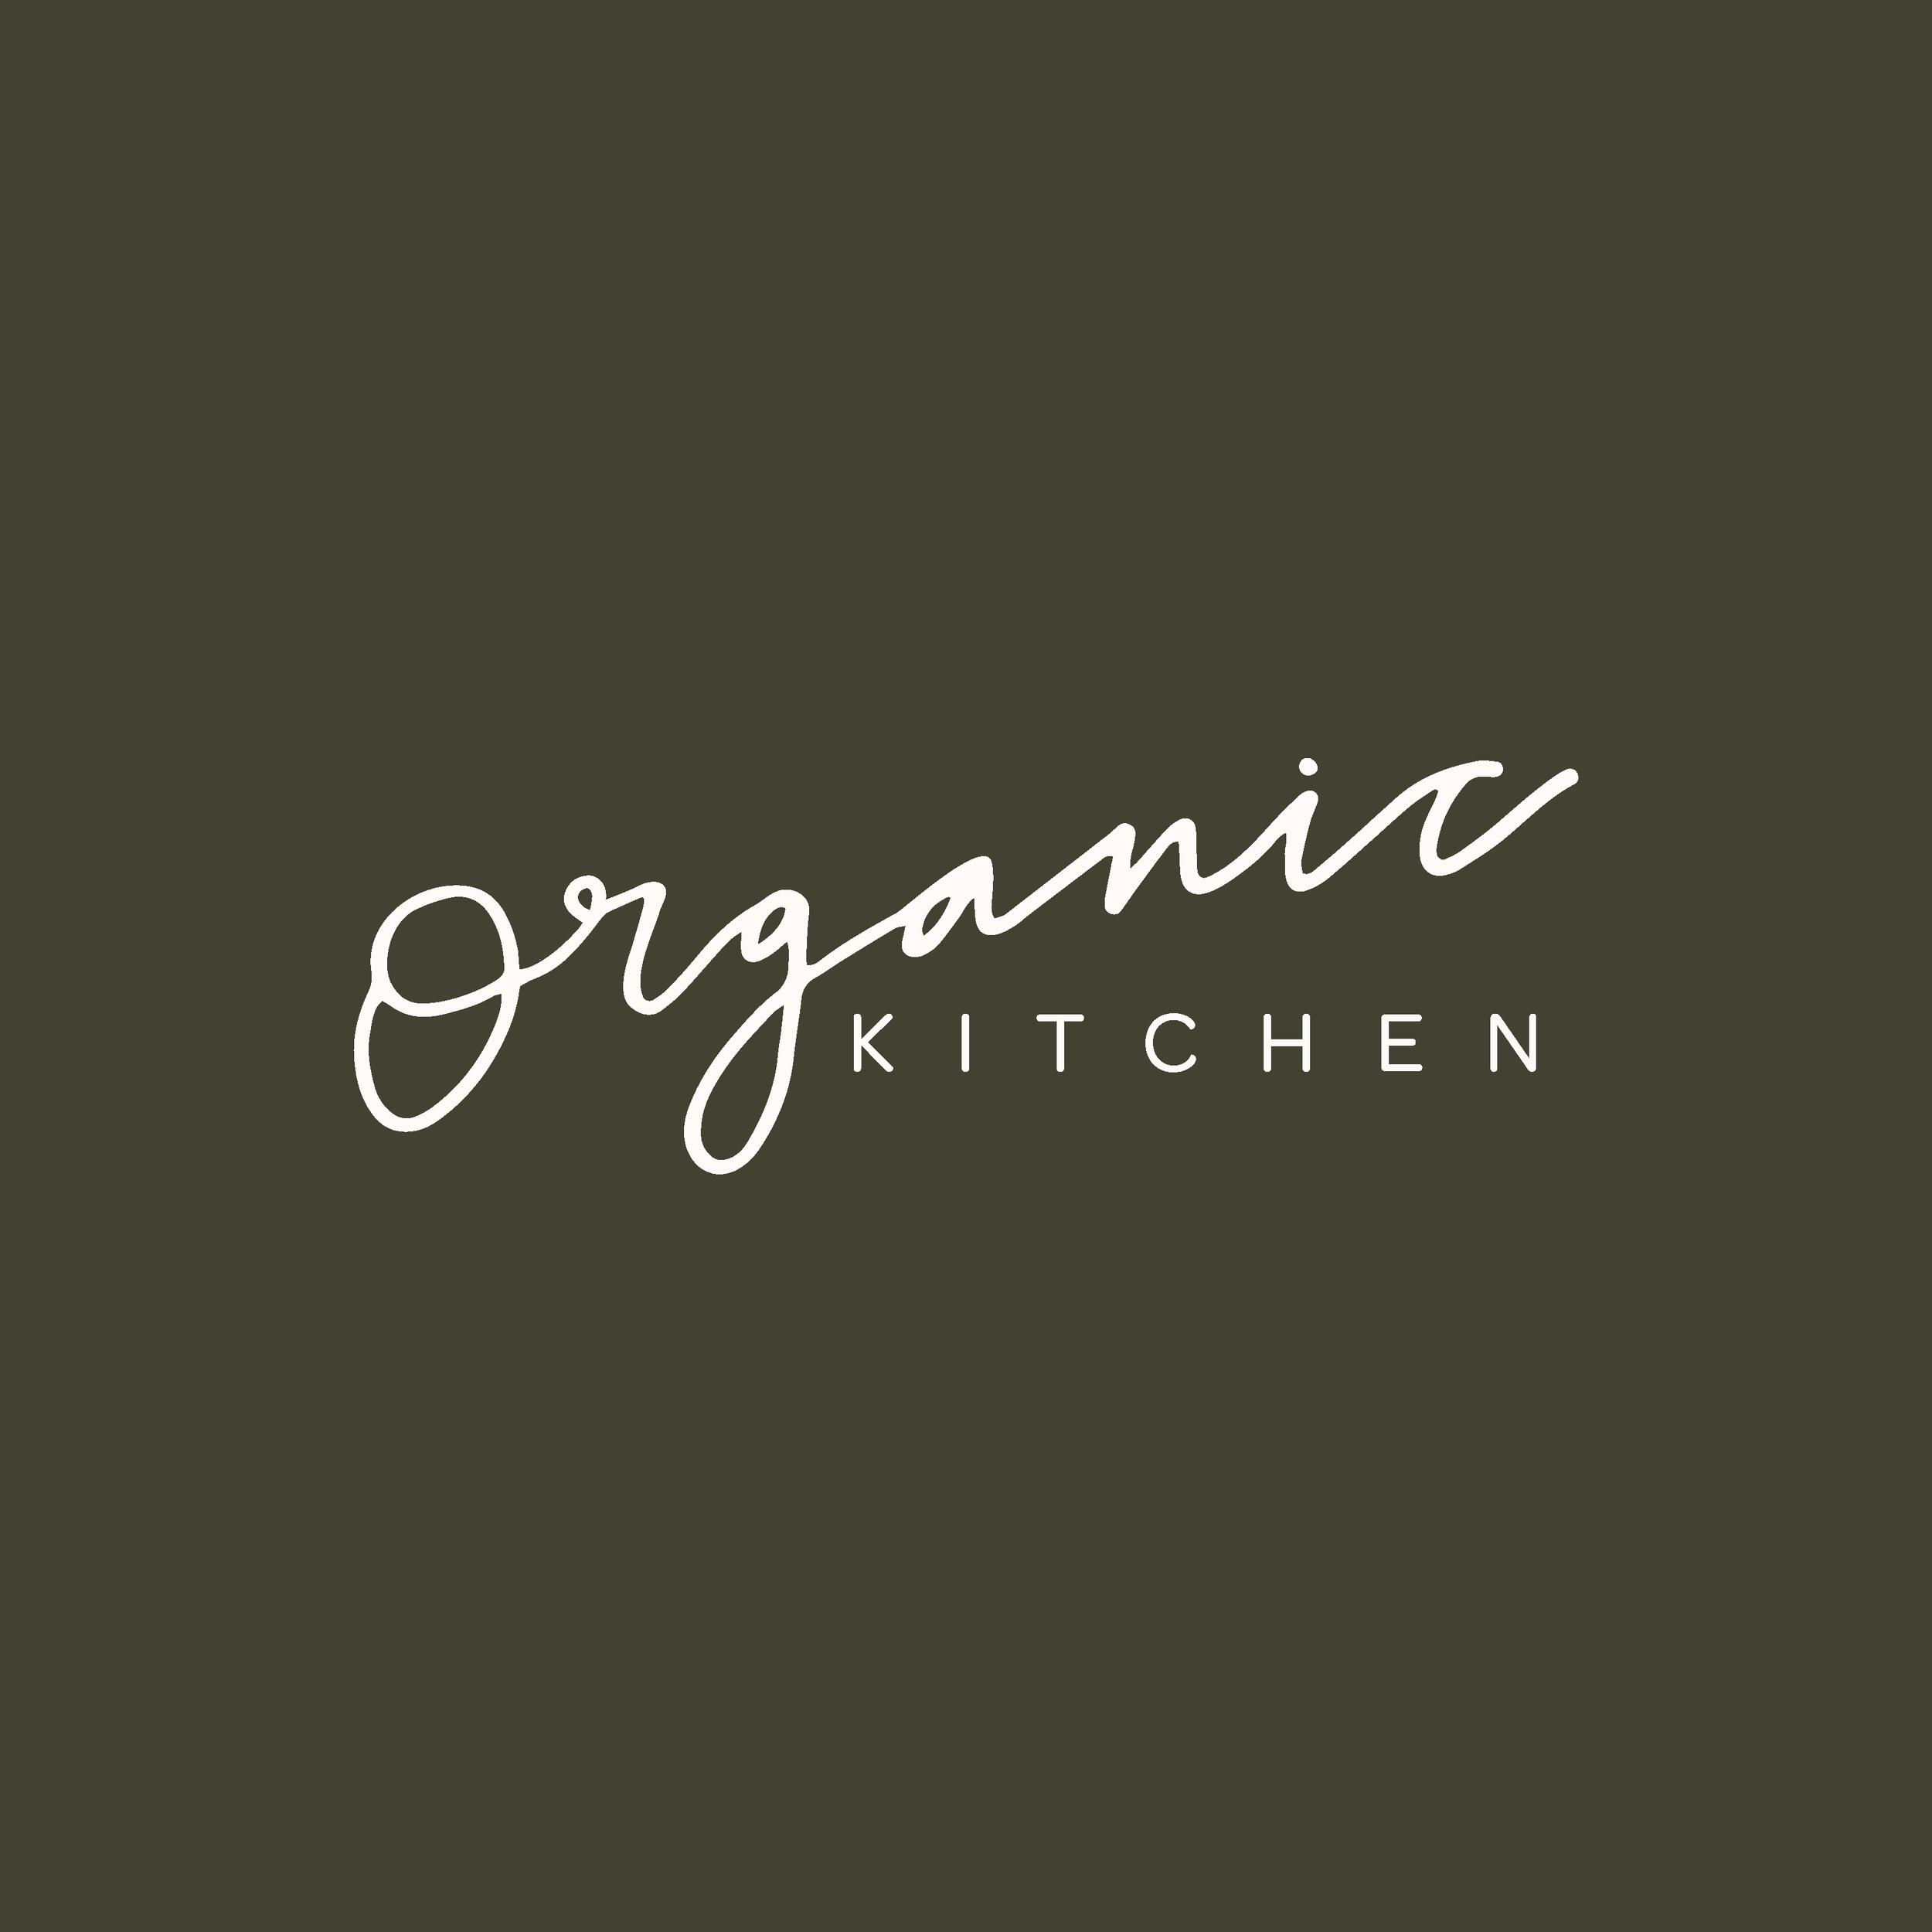 organic kitchen-square.png